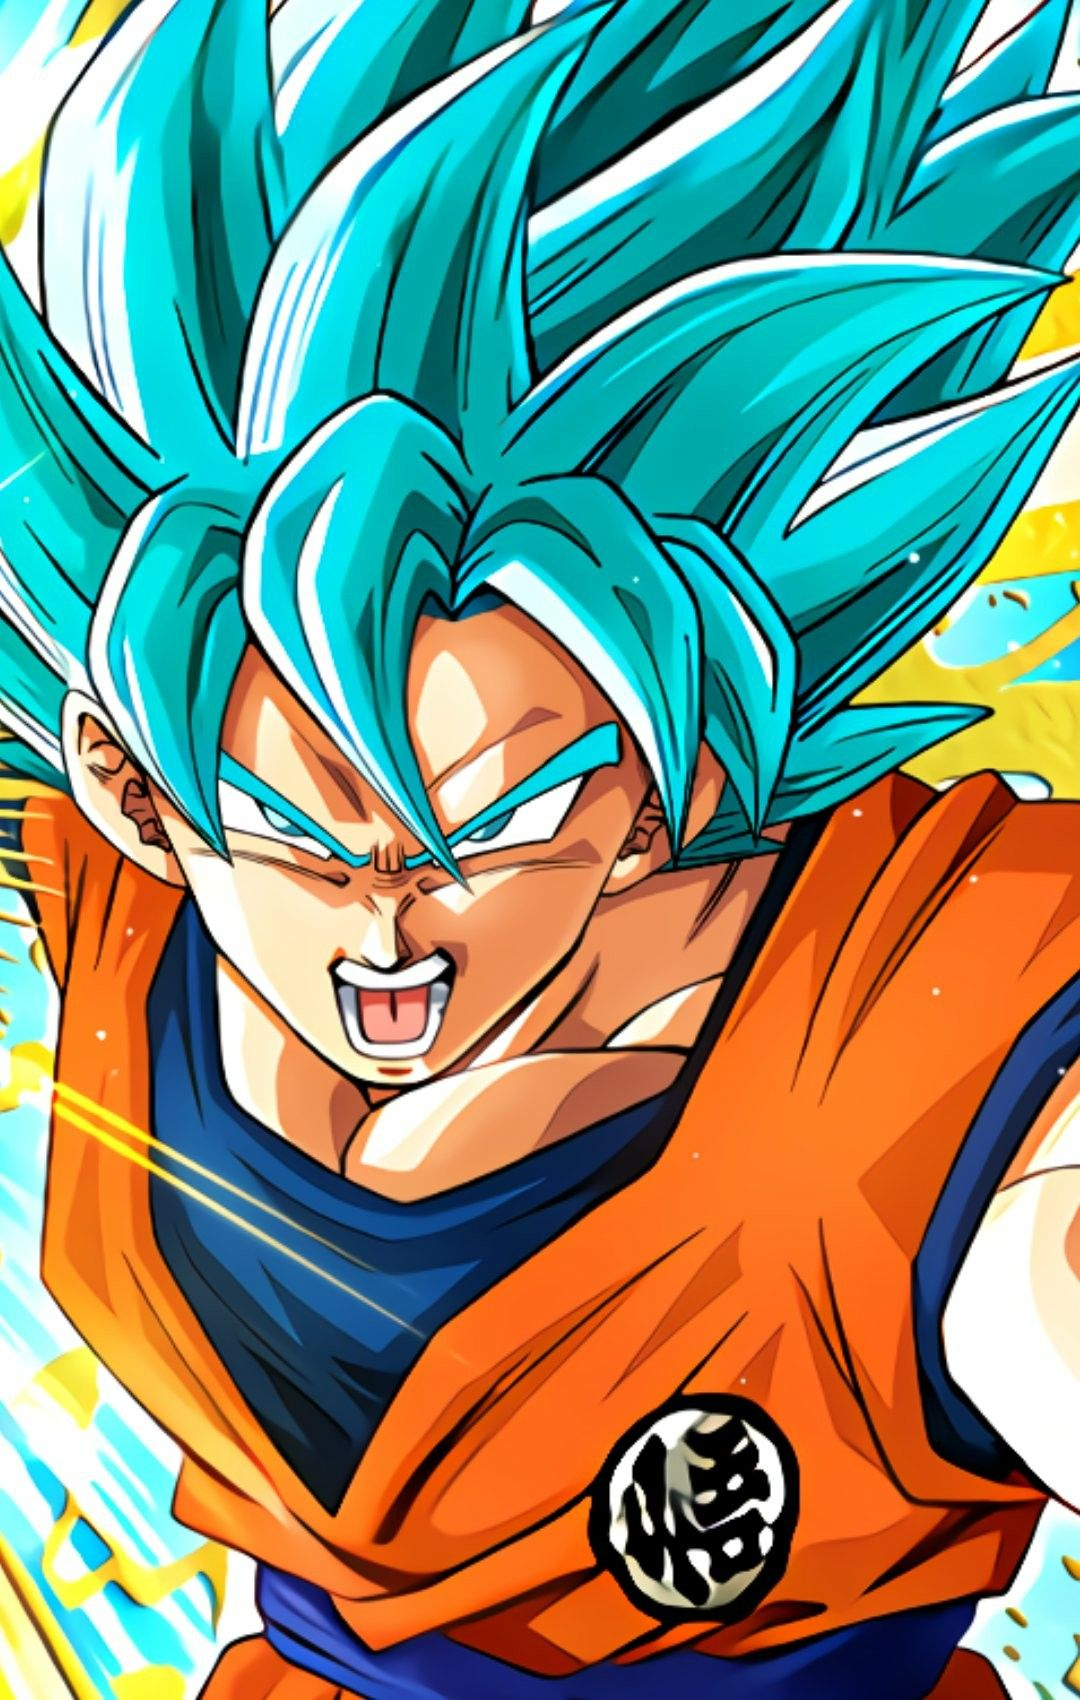 Ssb Goku Personajes De Dragon Ball Pantalla De Goku Dibujo De Goku